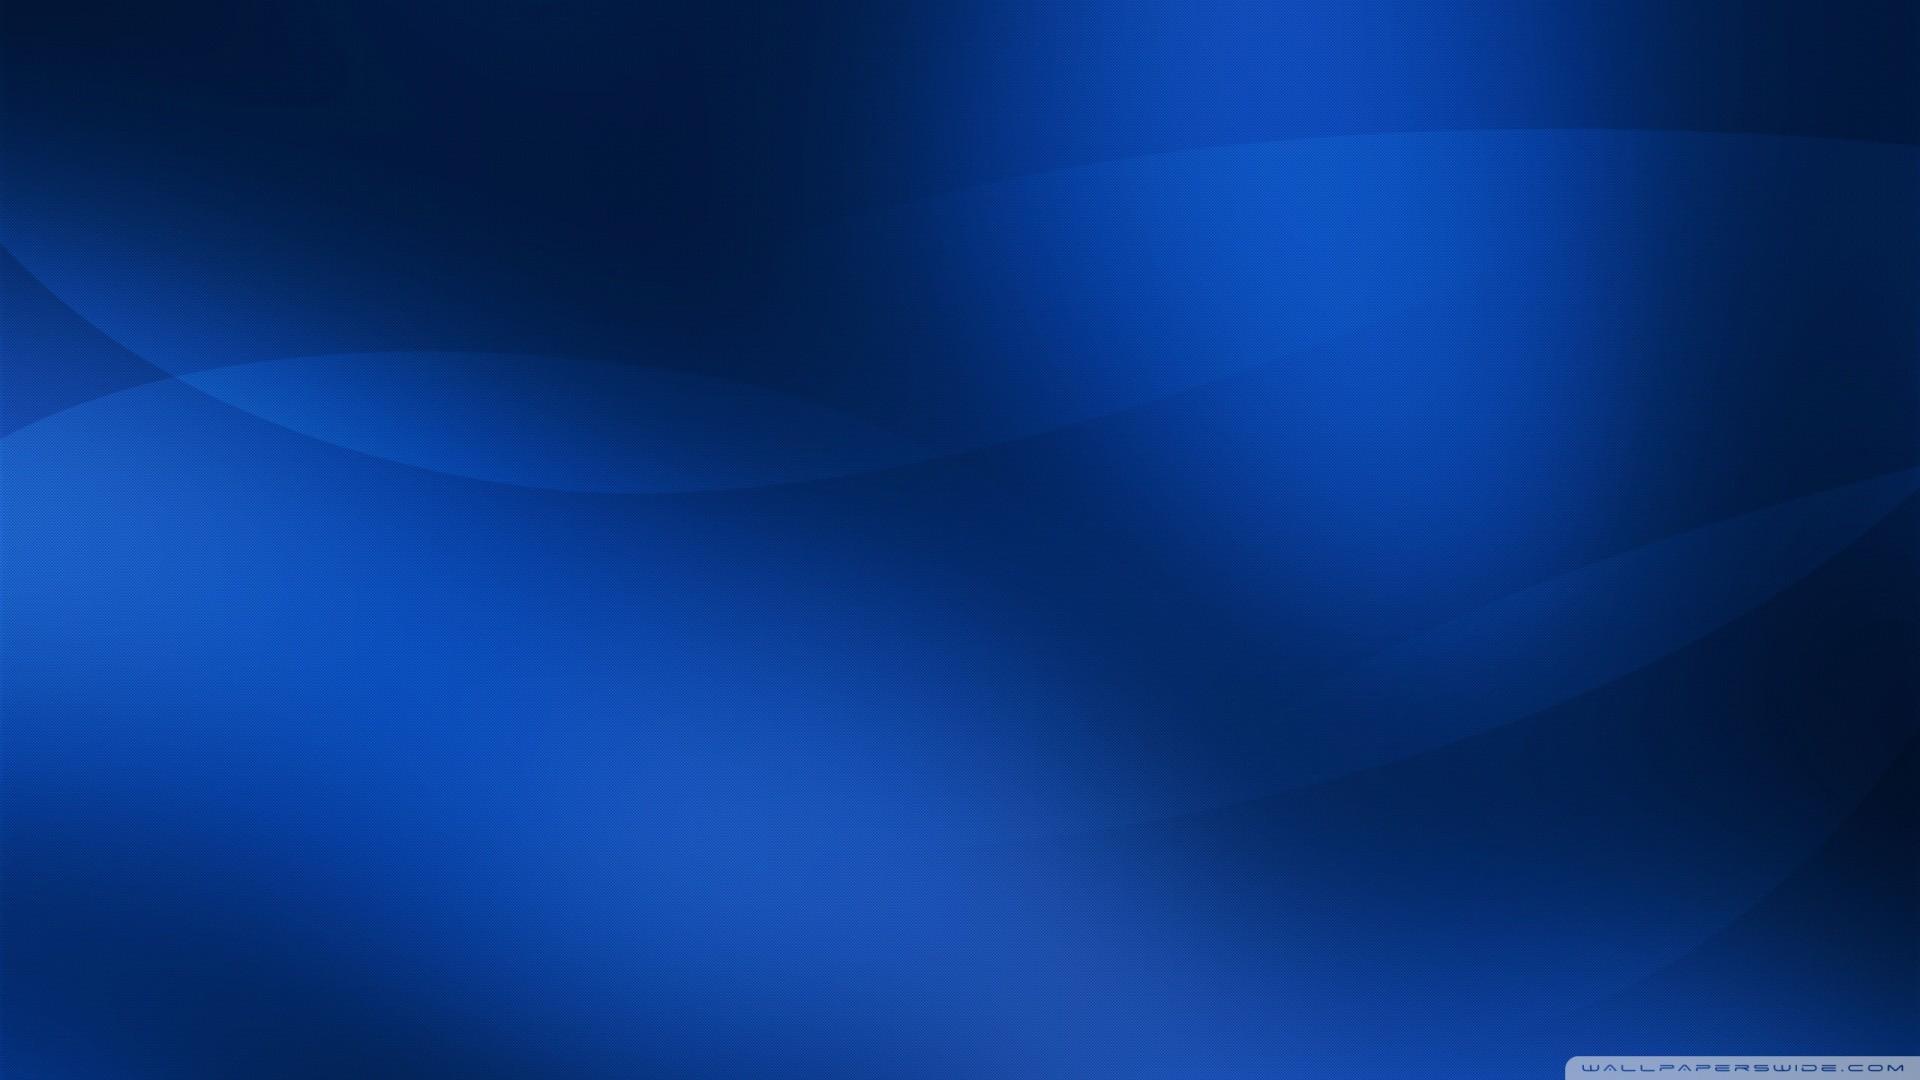 SLZ Blue Wallpapers